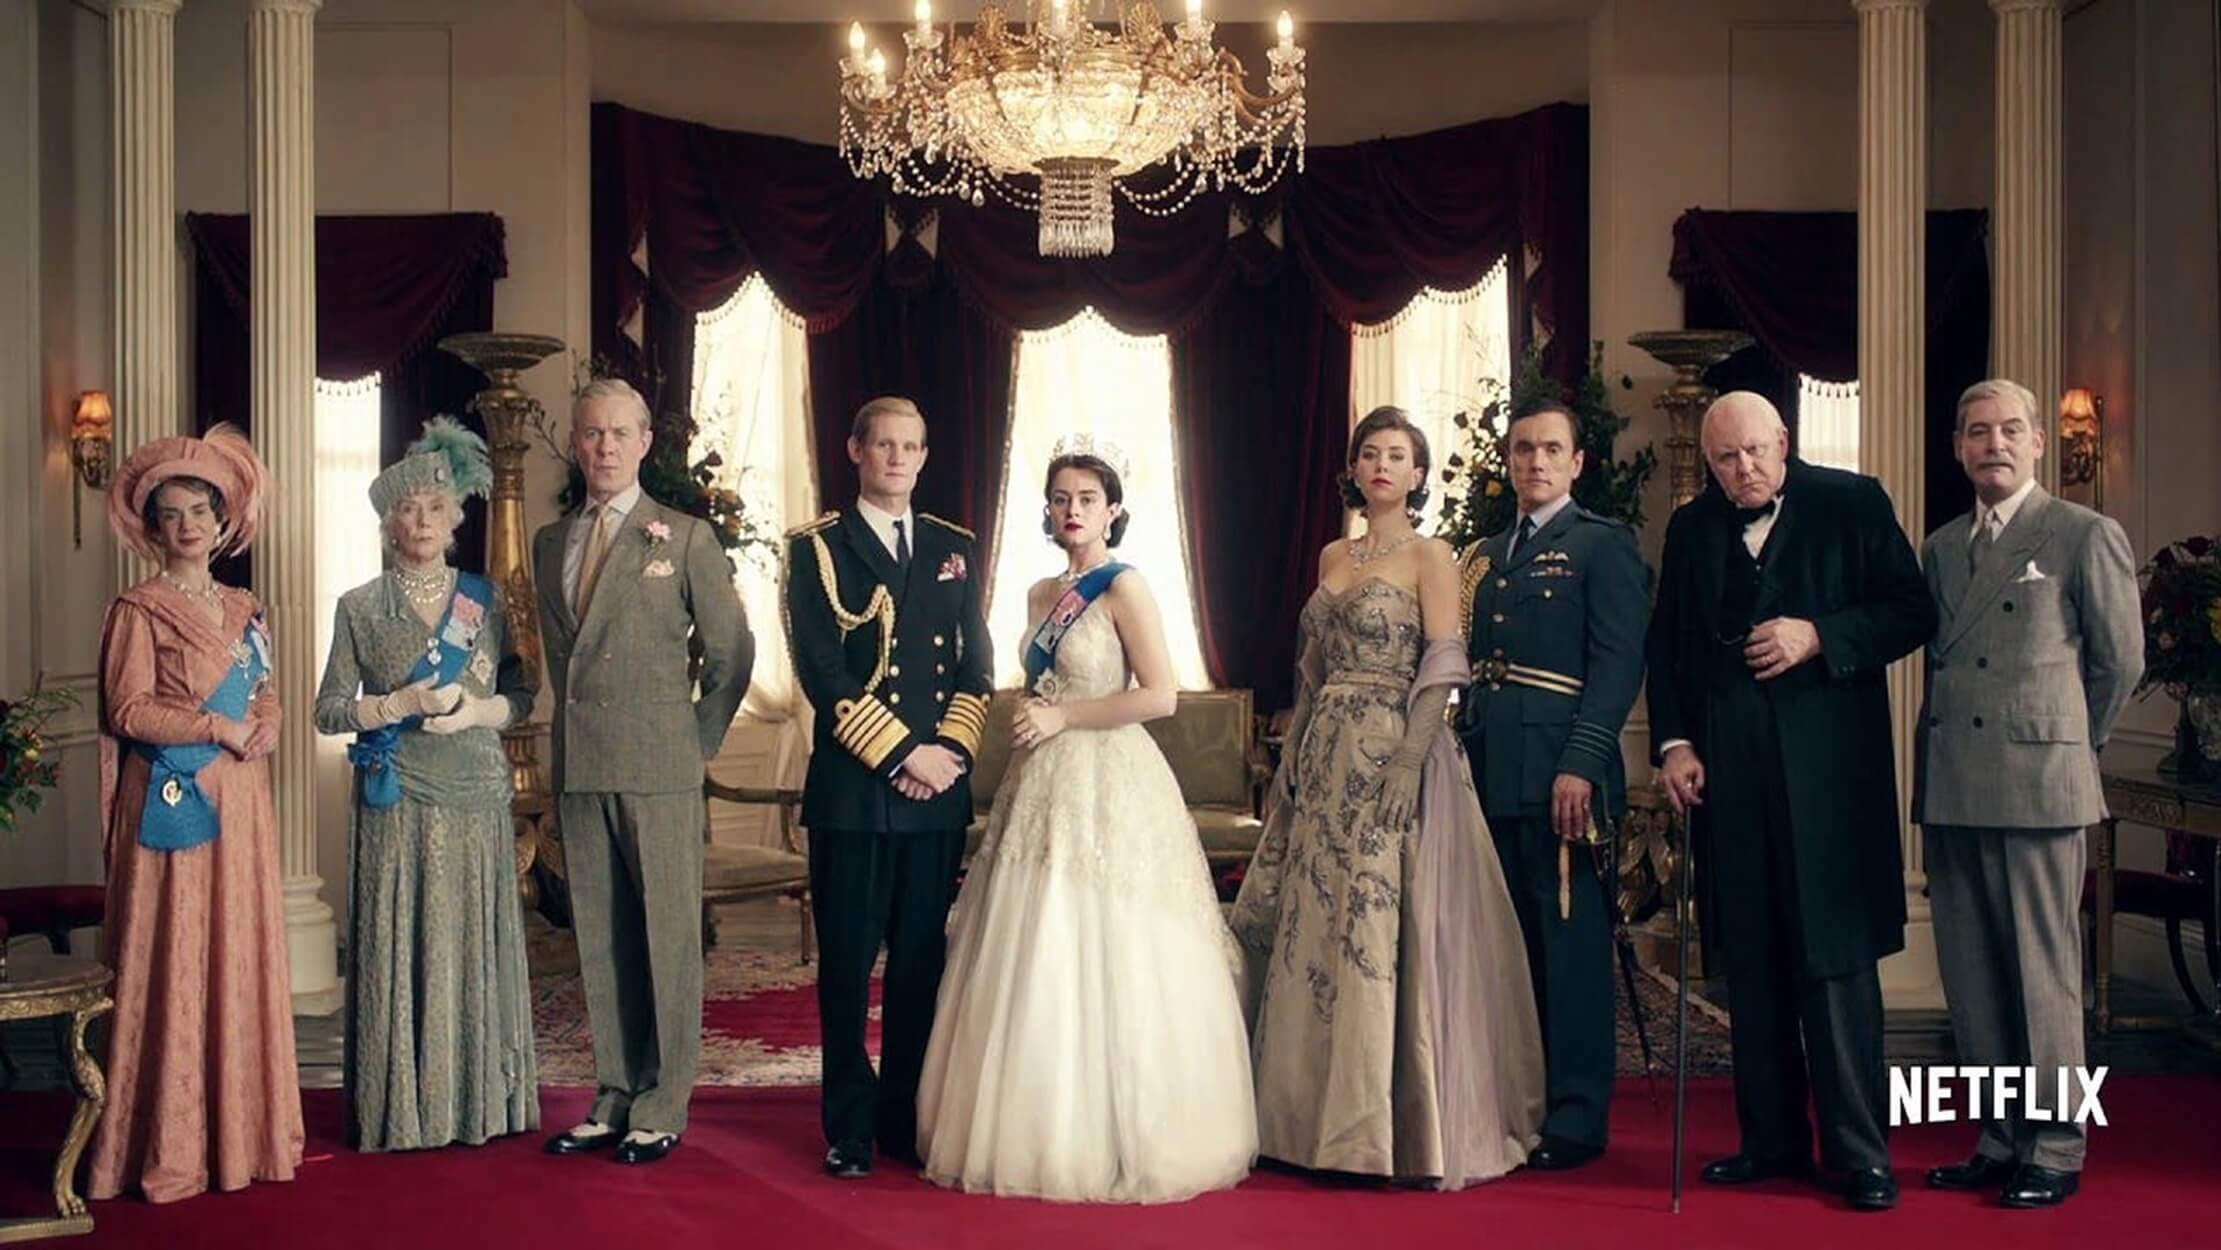 Netflix Files – Η Τζίλιαν Αντερσον θα υποδυθεί την Θάτσερ στο The Crown